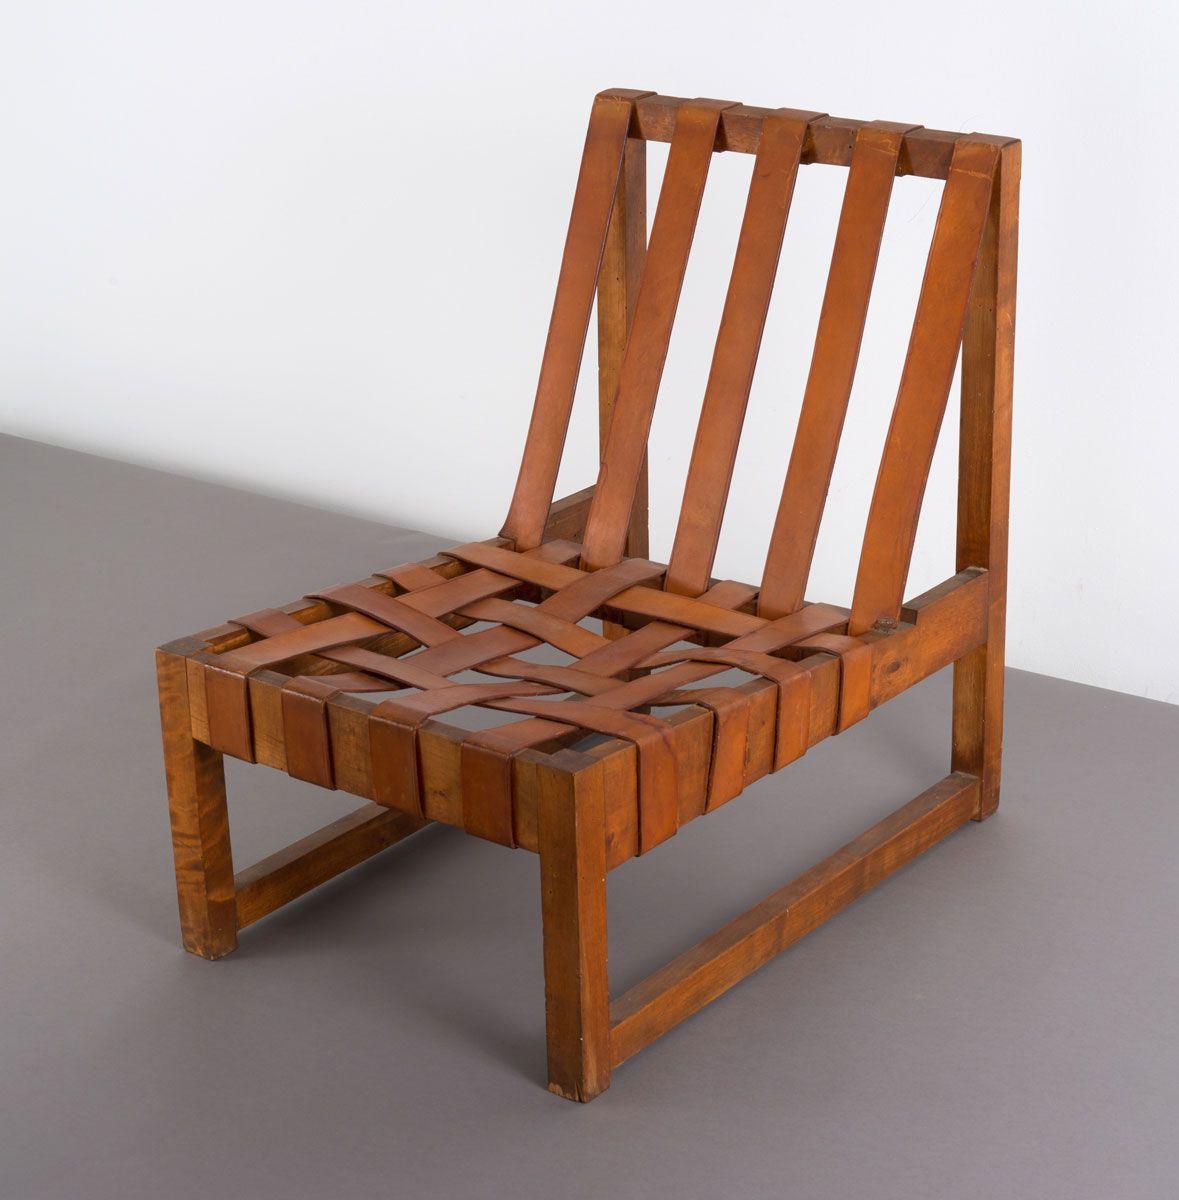 lot 113a101 zwei 39 bauhaus 39 sessel 1920 30er jahre breuer marcel dieckmann erich im stile. Black Bedroom Furniture Sets. Home Design Ideas